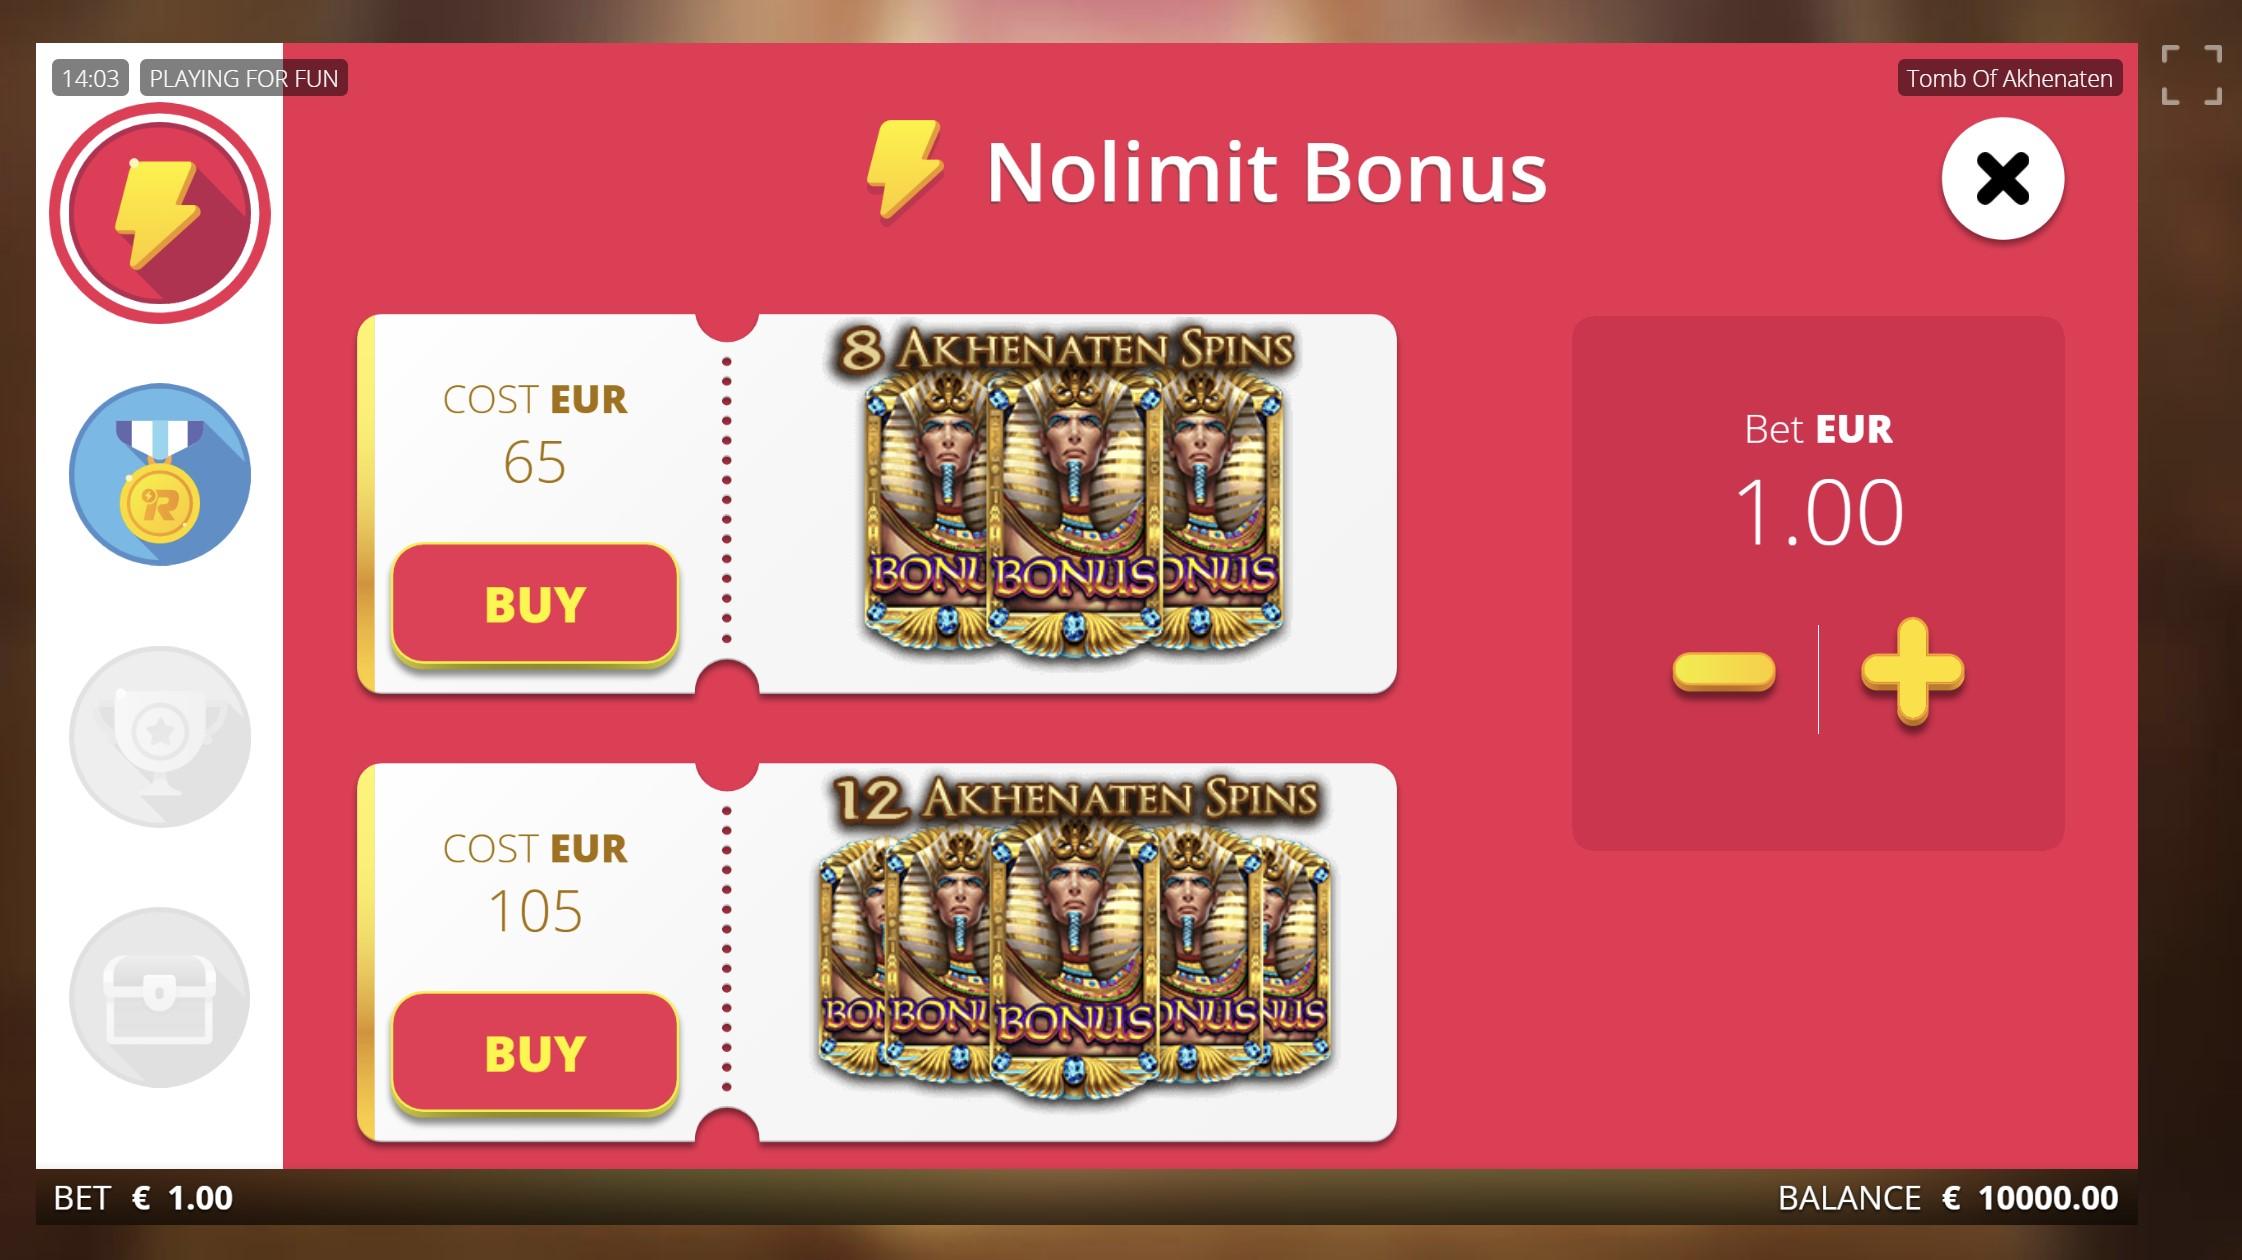 tomb of akhenaten free spins nolimit bonus